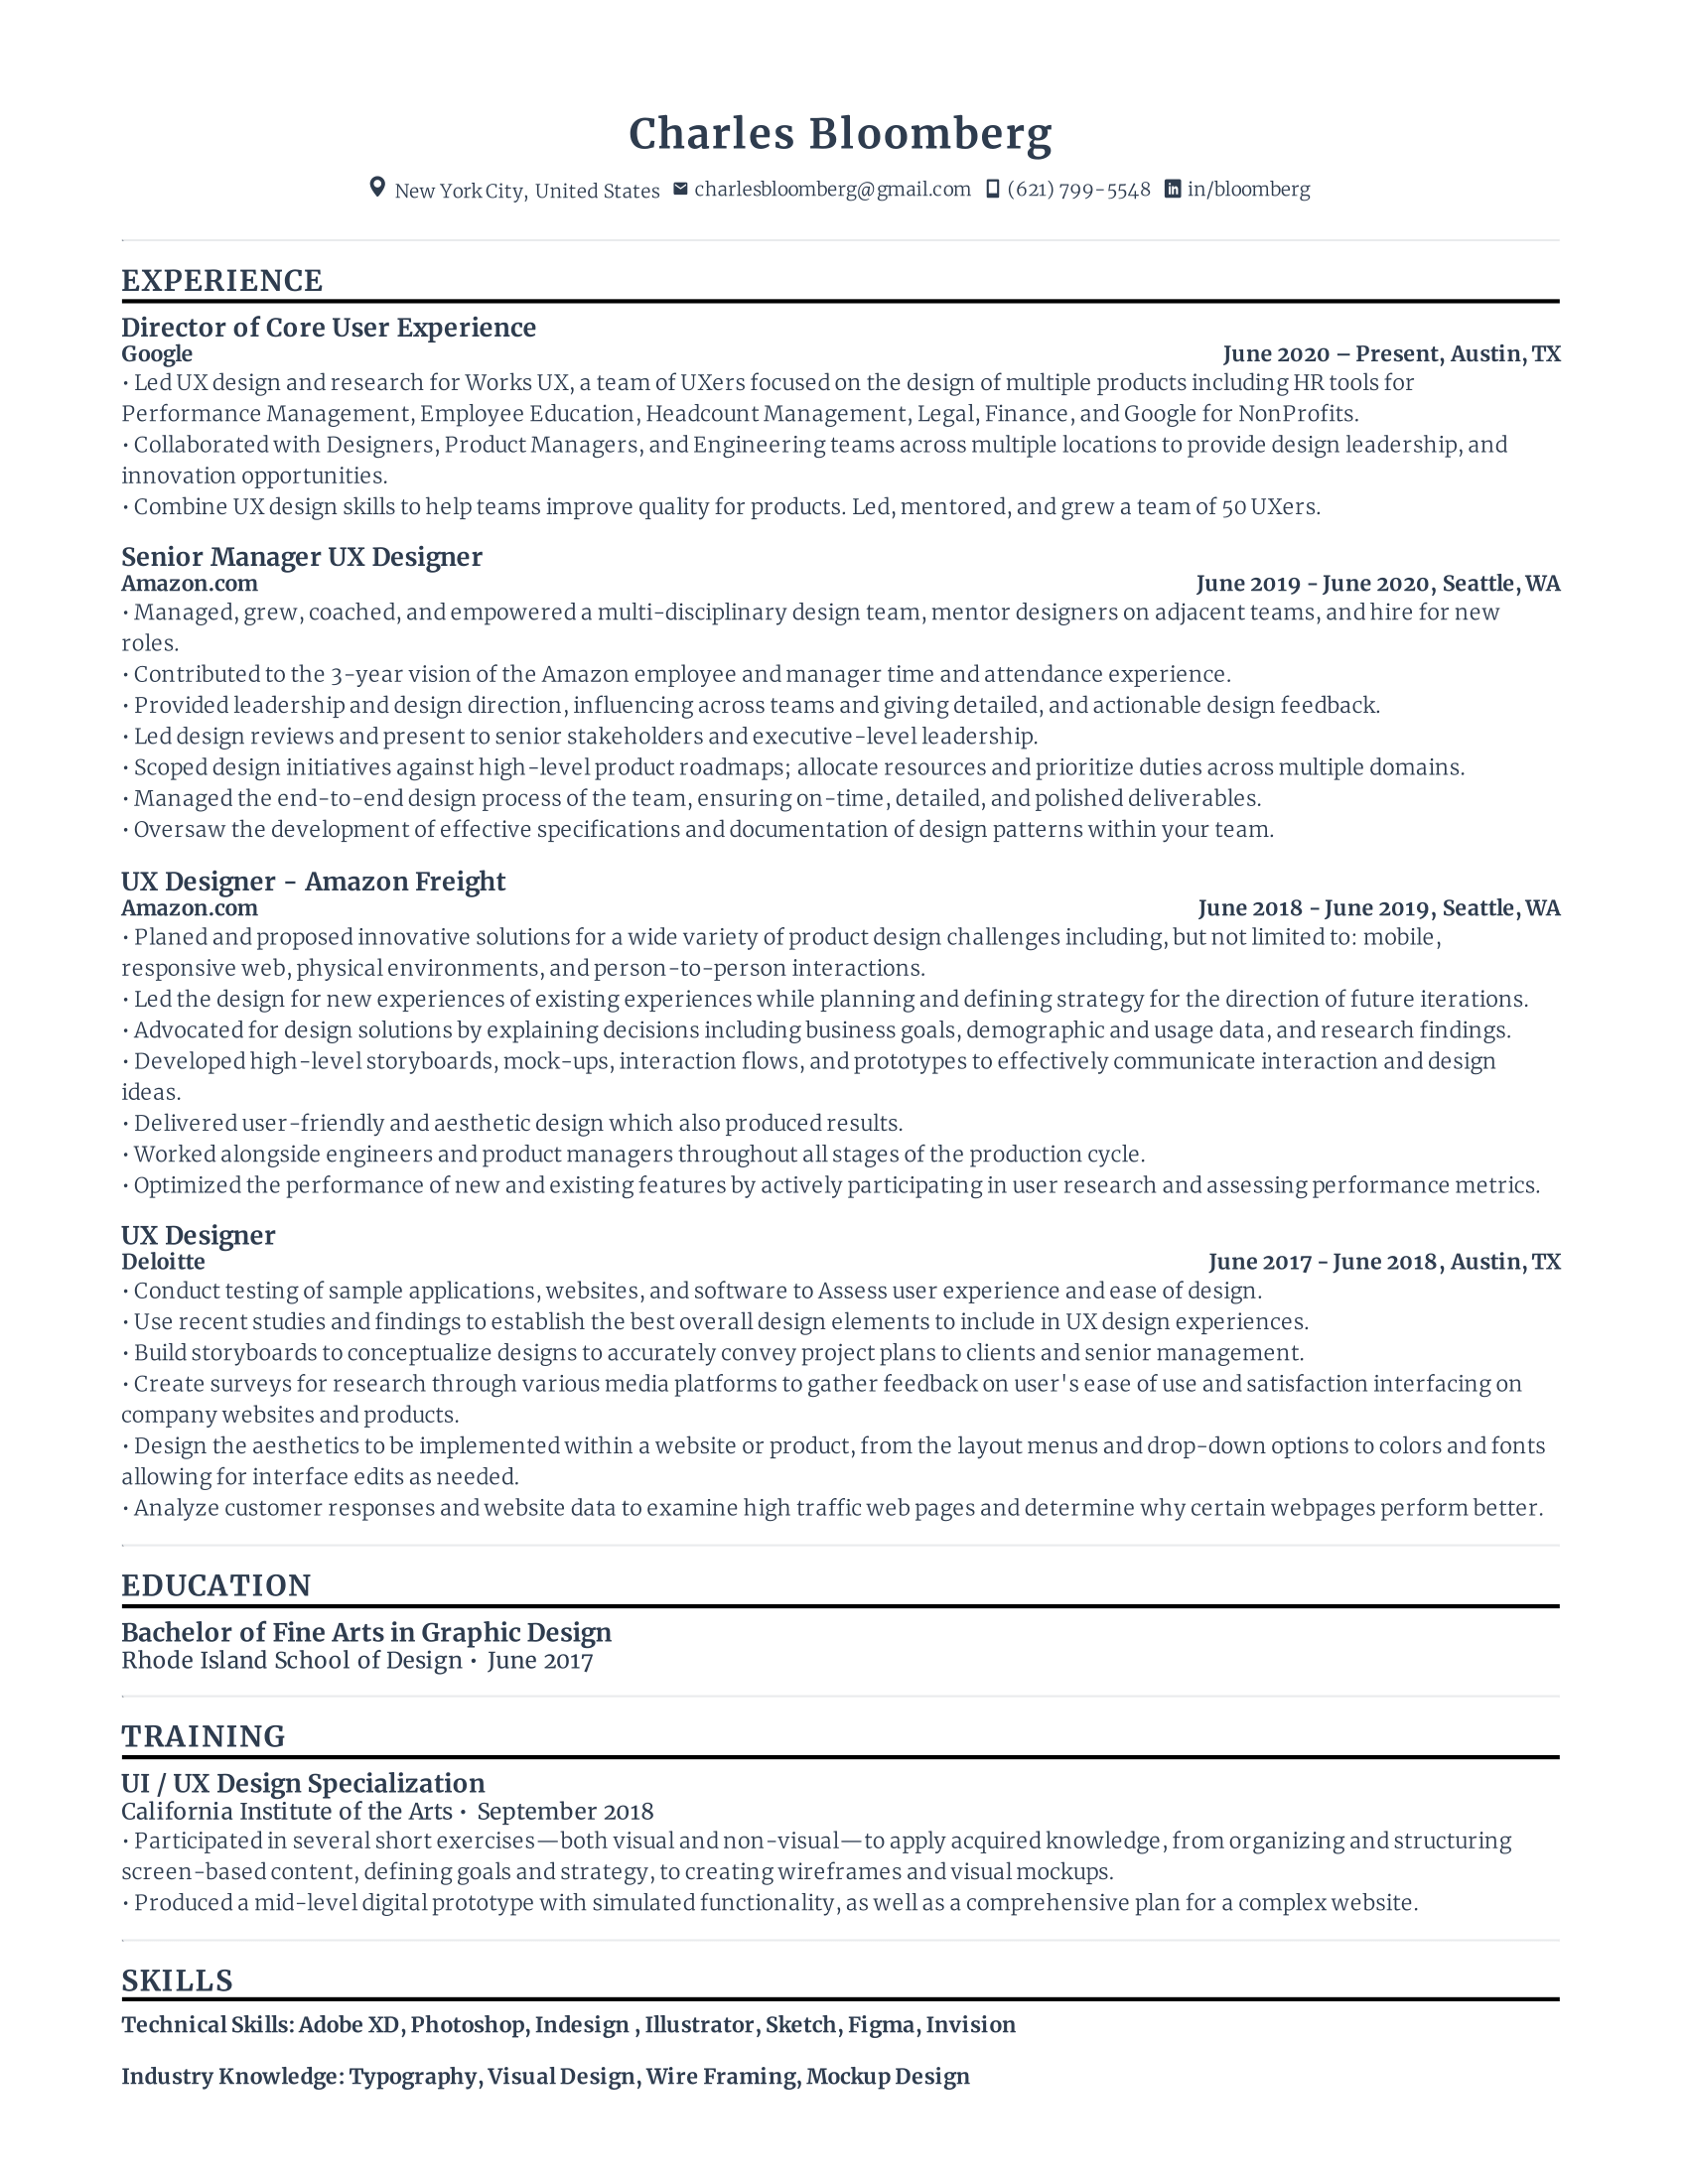 UX Designer Resume Template